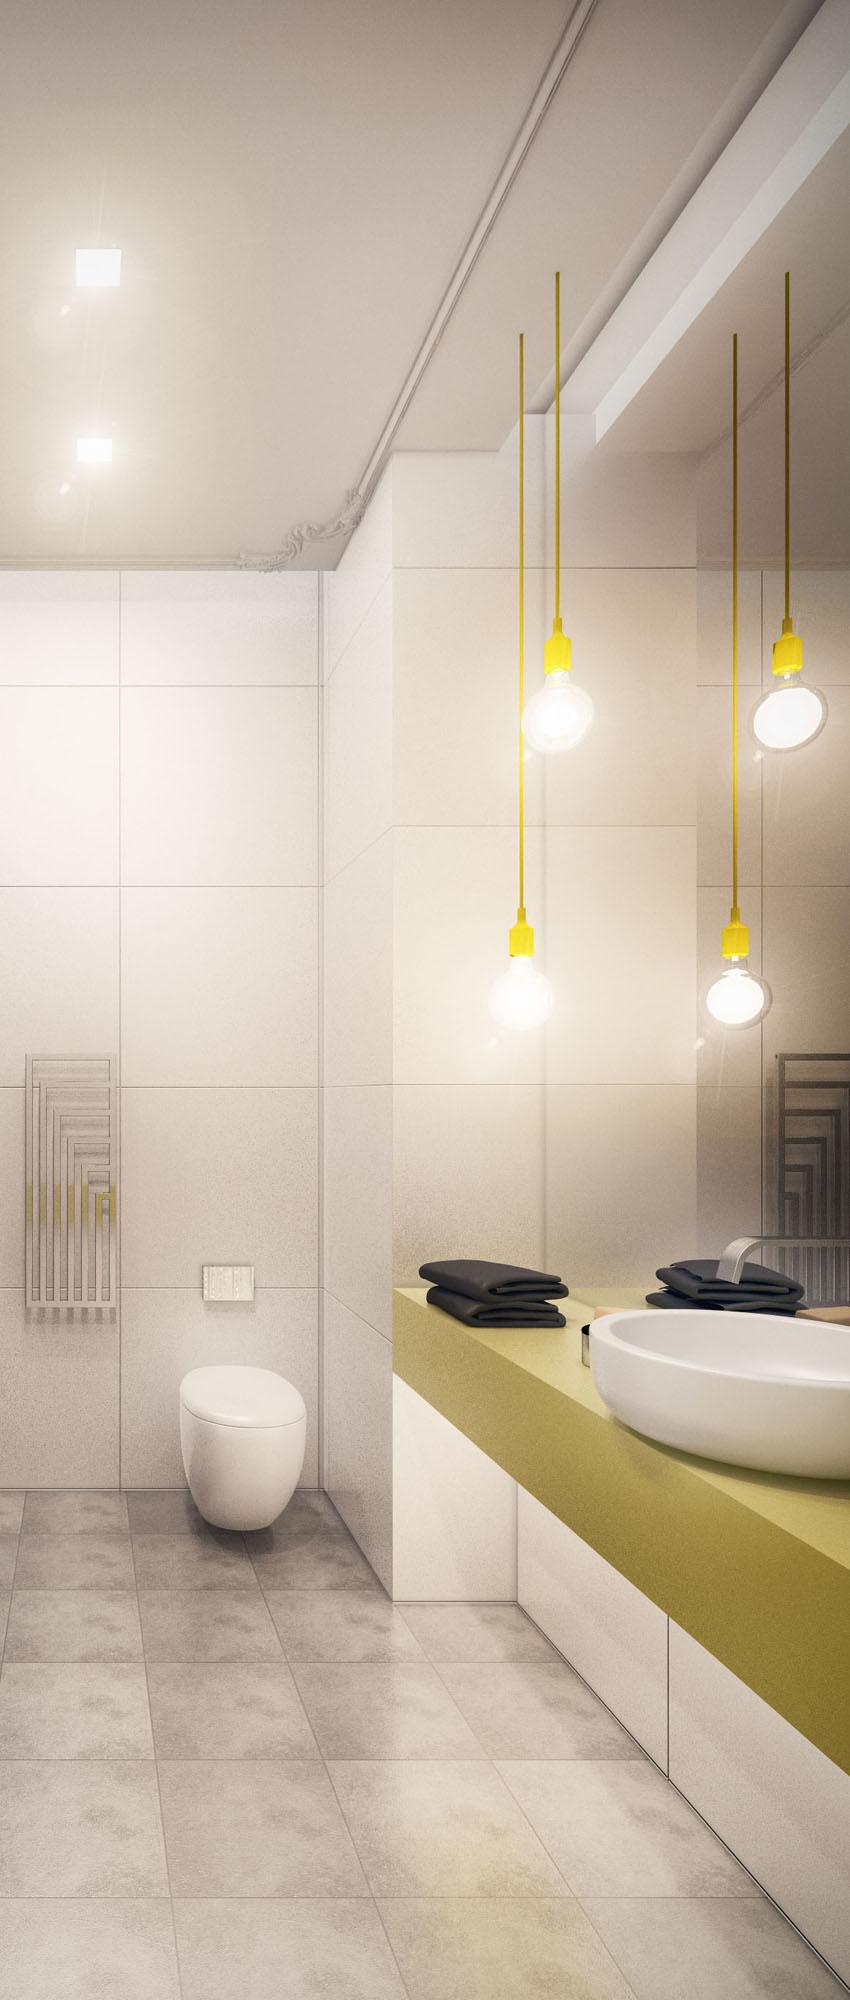 Bathroom of small modern apartment 1 on Behance on Small Apartment Bathroom  id=23624